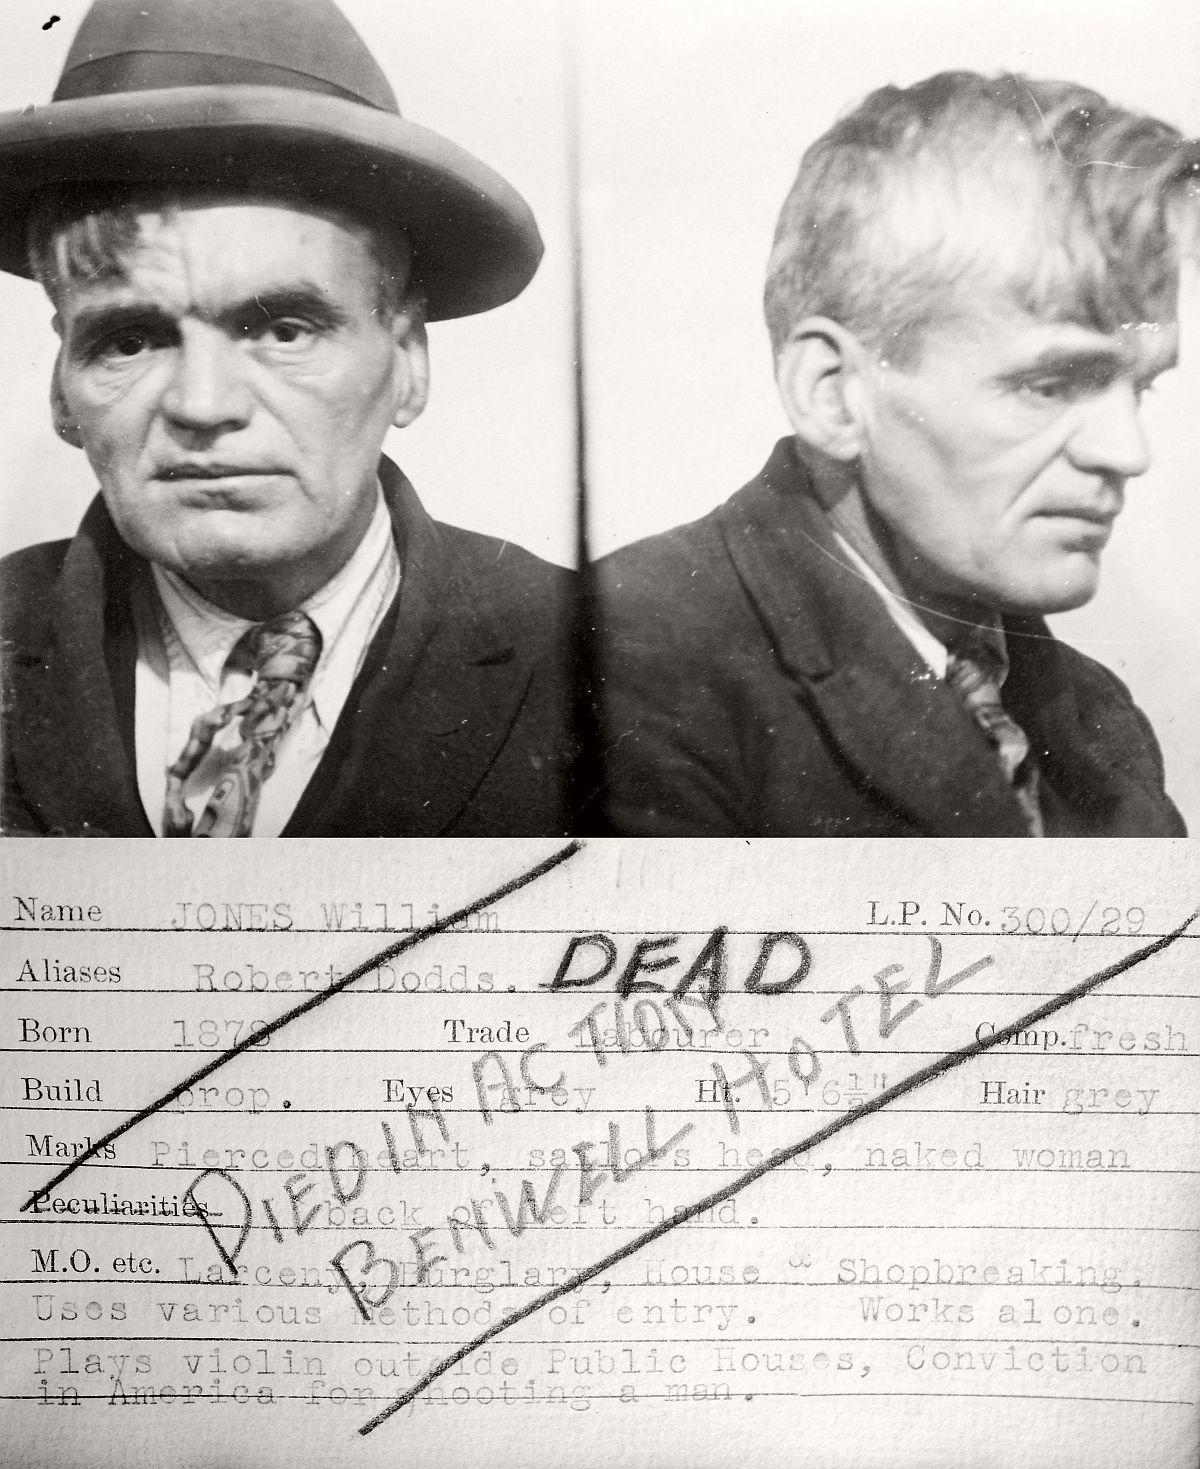 vintage-mug-shot-of-criminals-from-newcastle-upon-tyne-1930s-21